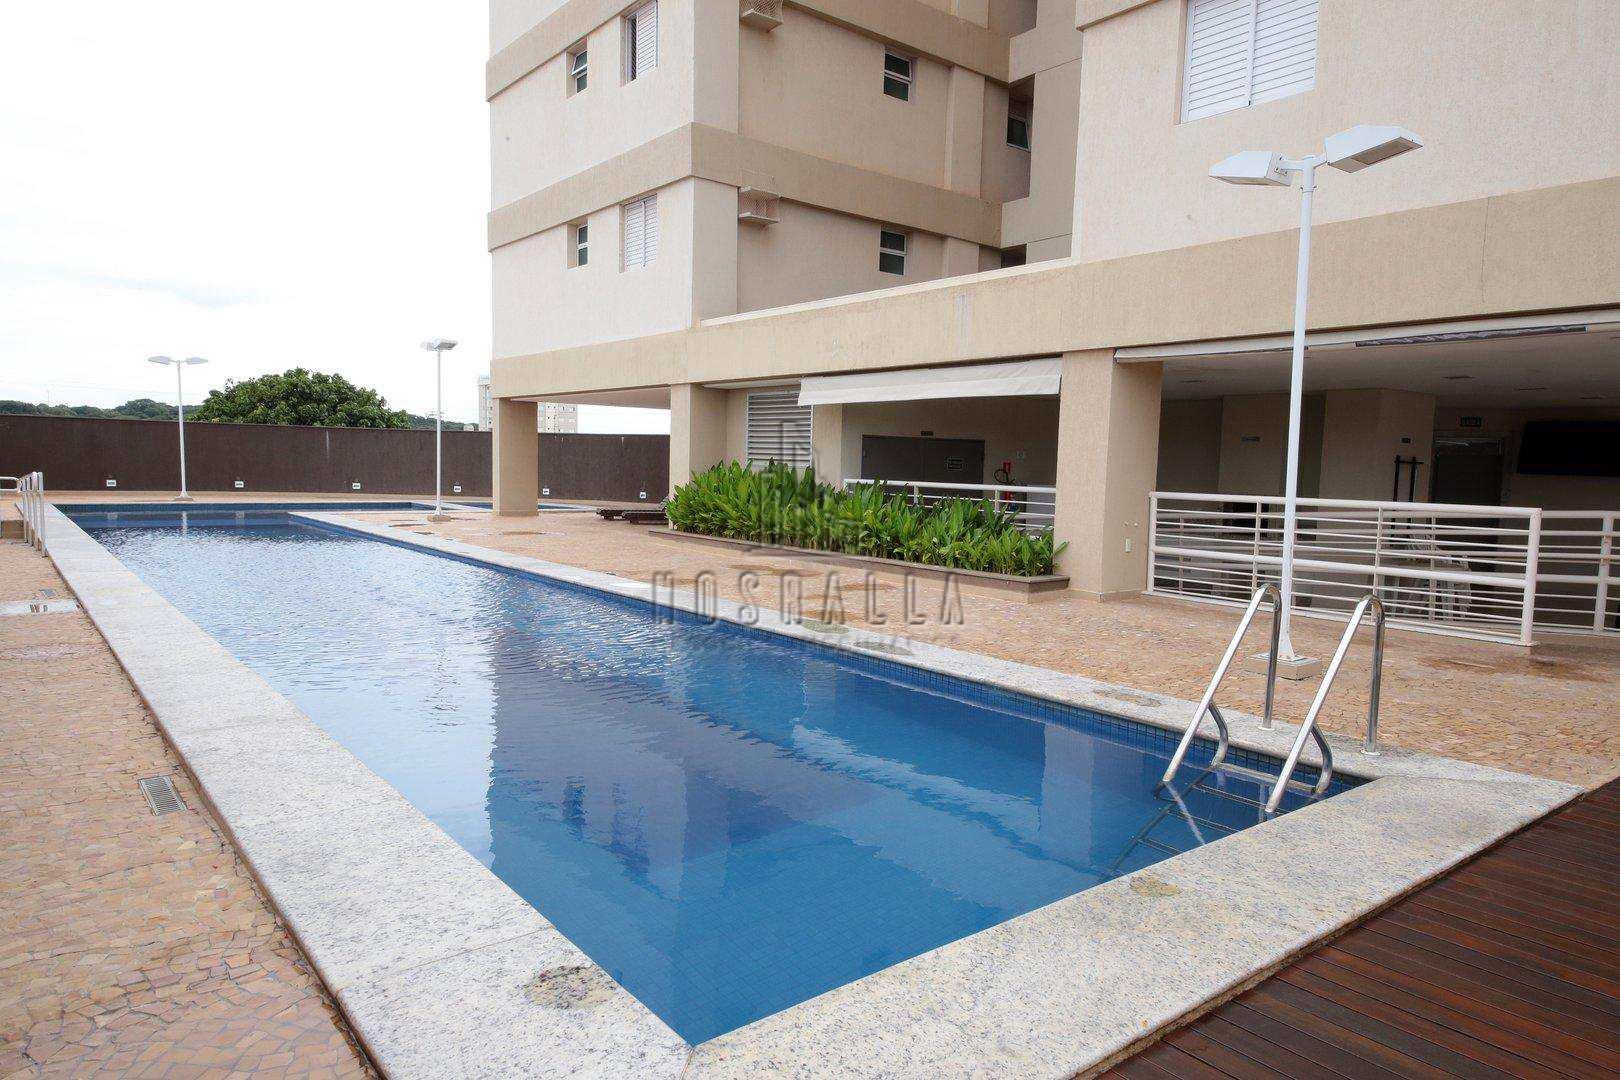 piscinas-2.JPG.1920x1080_q85